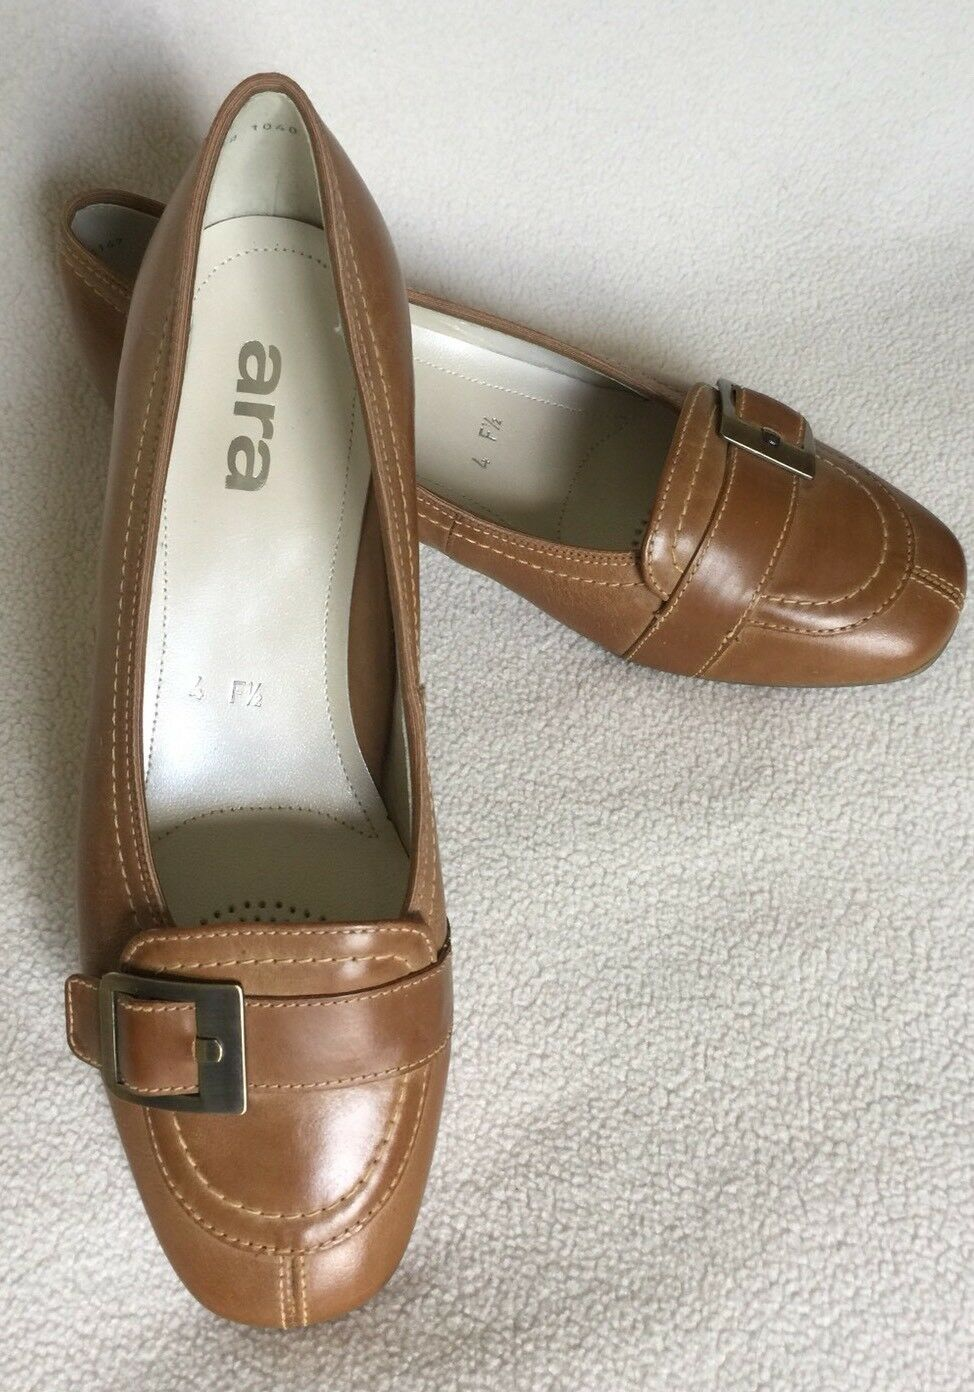 New ARA Butterscotch Tan Leather shoes Buckle sz 4  F 1 2 (UK)